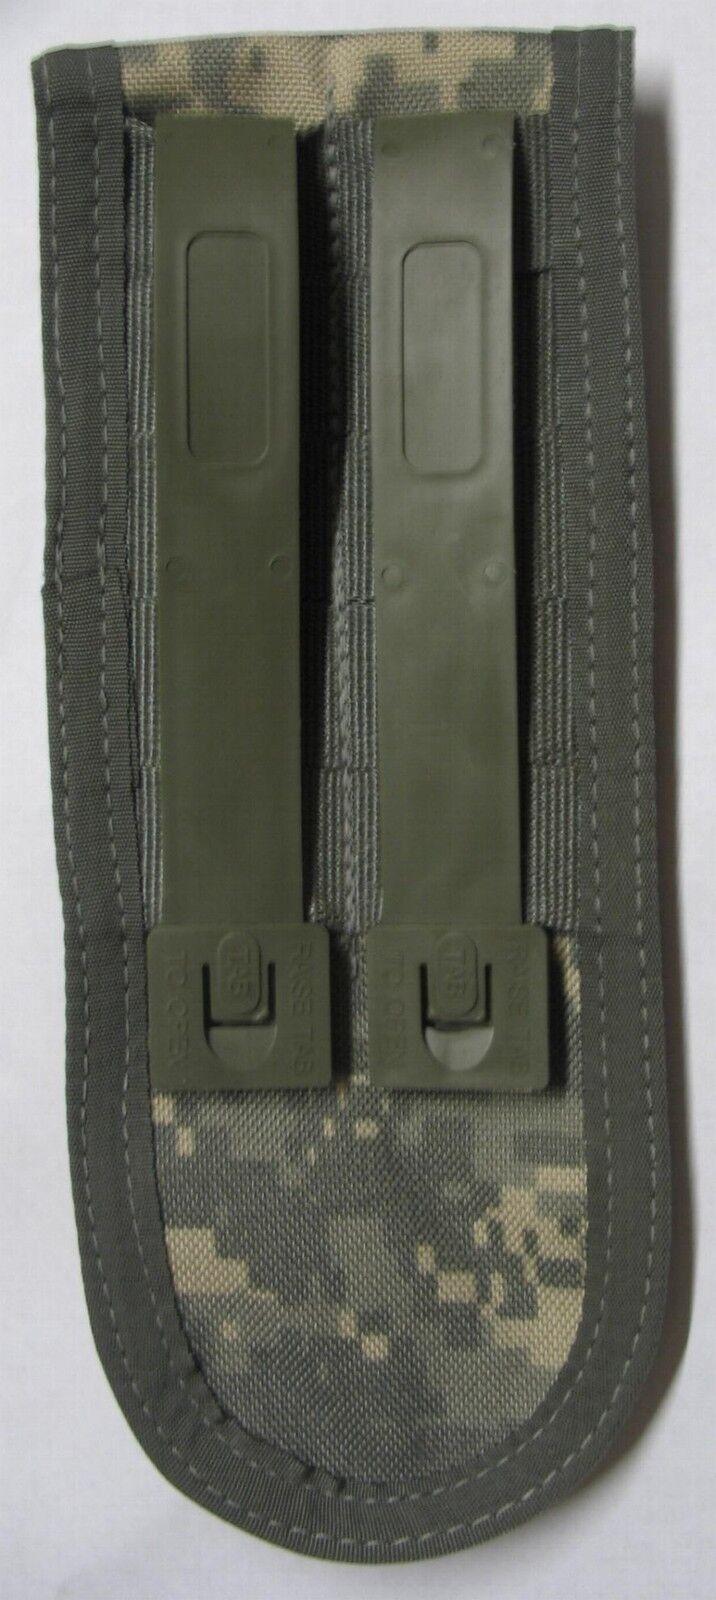 Gerber couteau étui fourreau ACU ACU ACU Camouflage Camo couteau de poche outils outil molle 9978d7